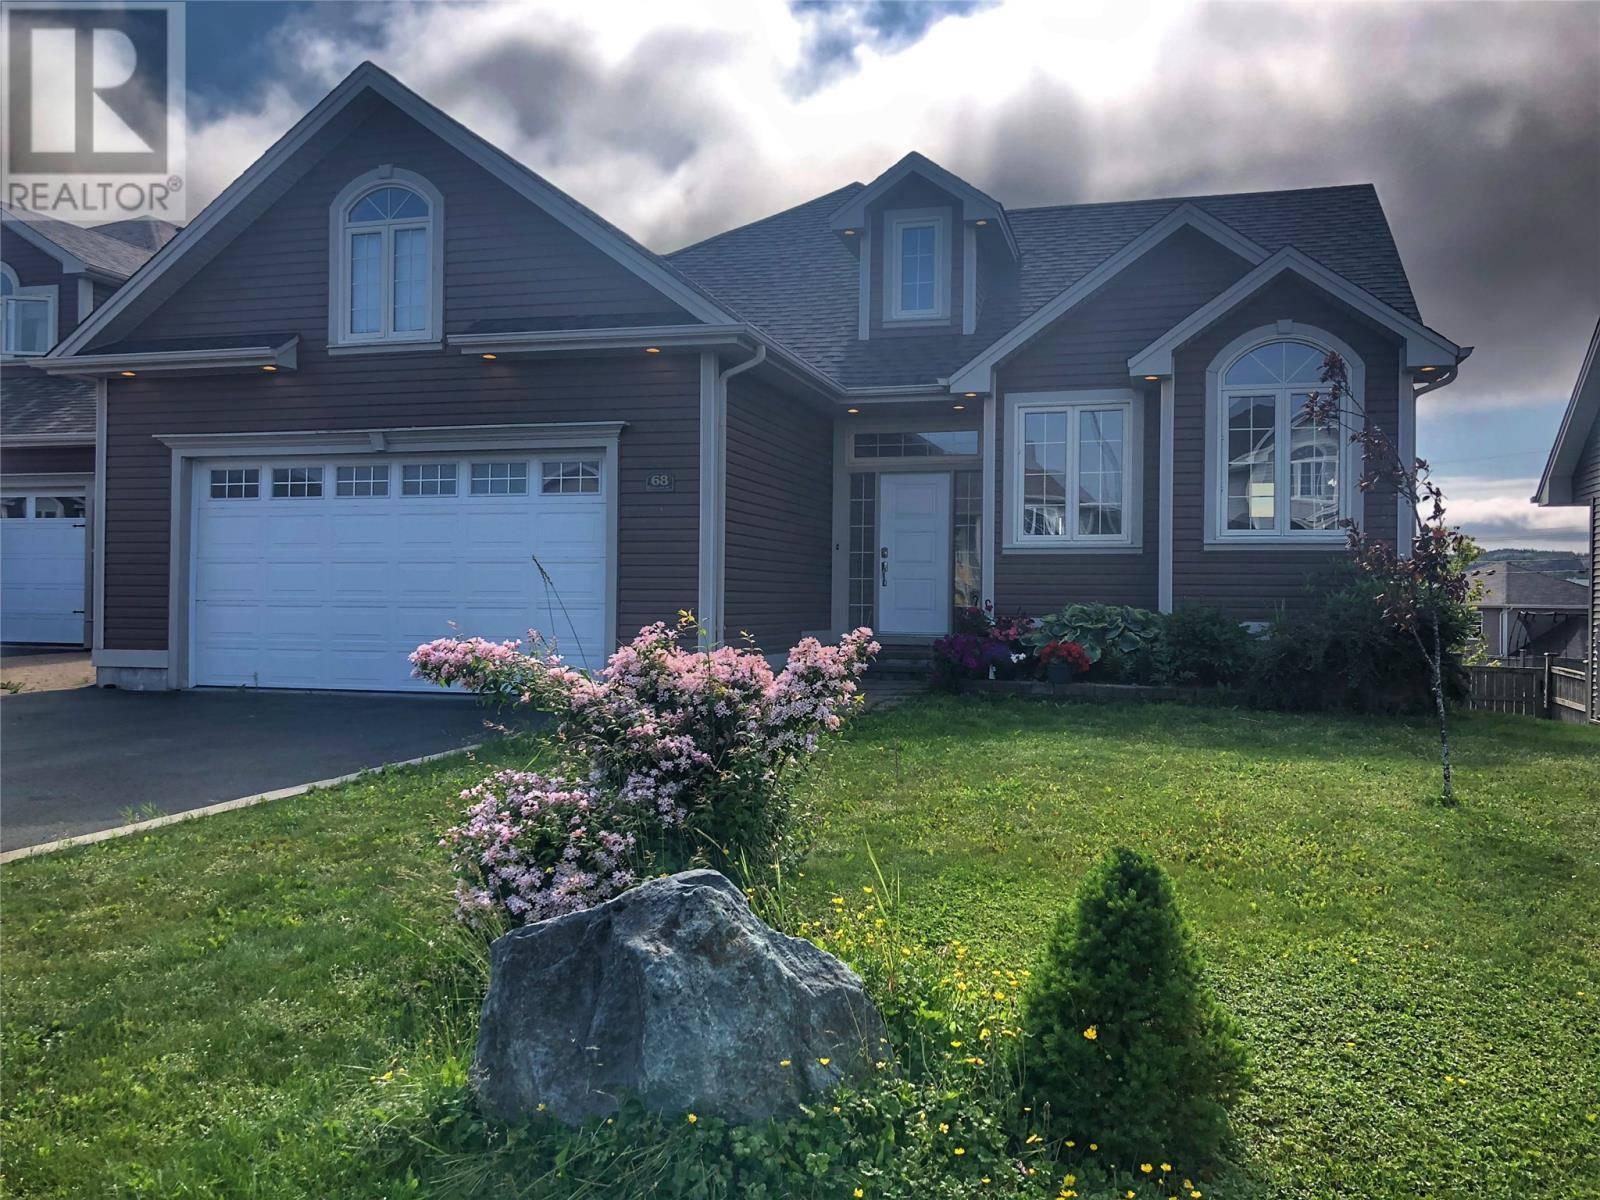 House for sale at 68 Julieann Pl St. John's Newfoundland - MLS: 1200118